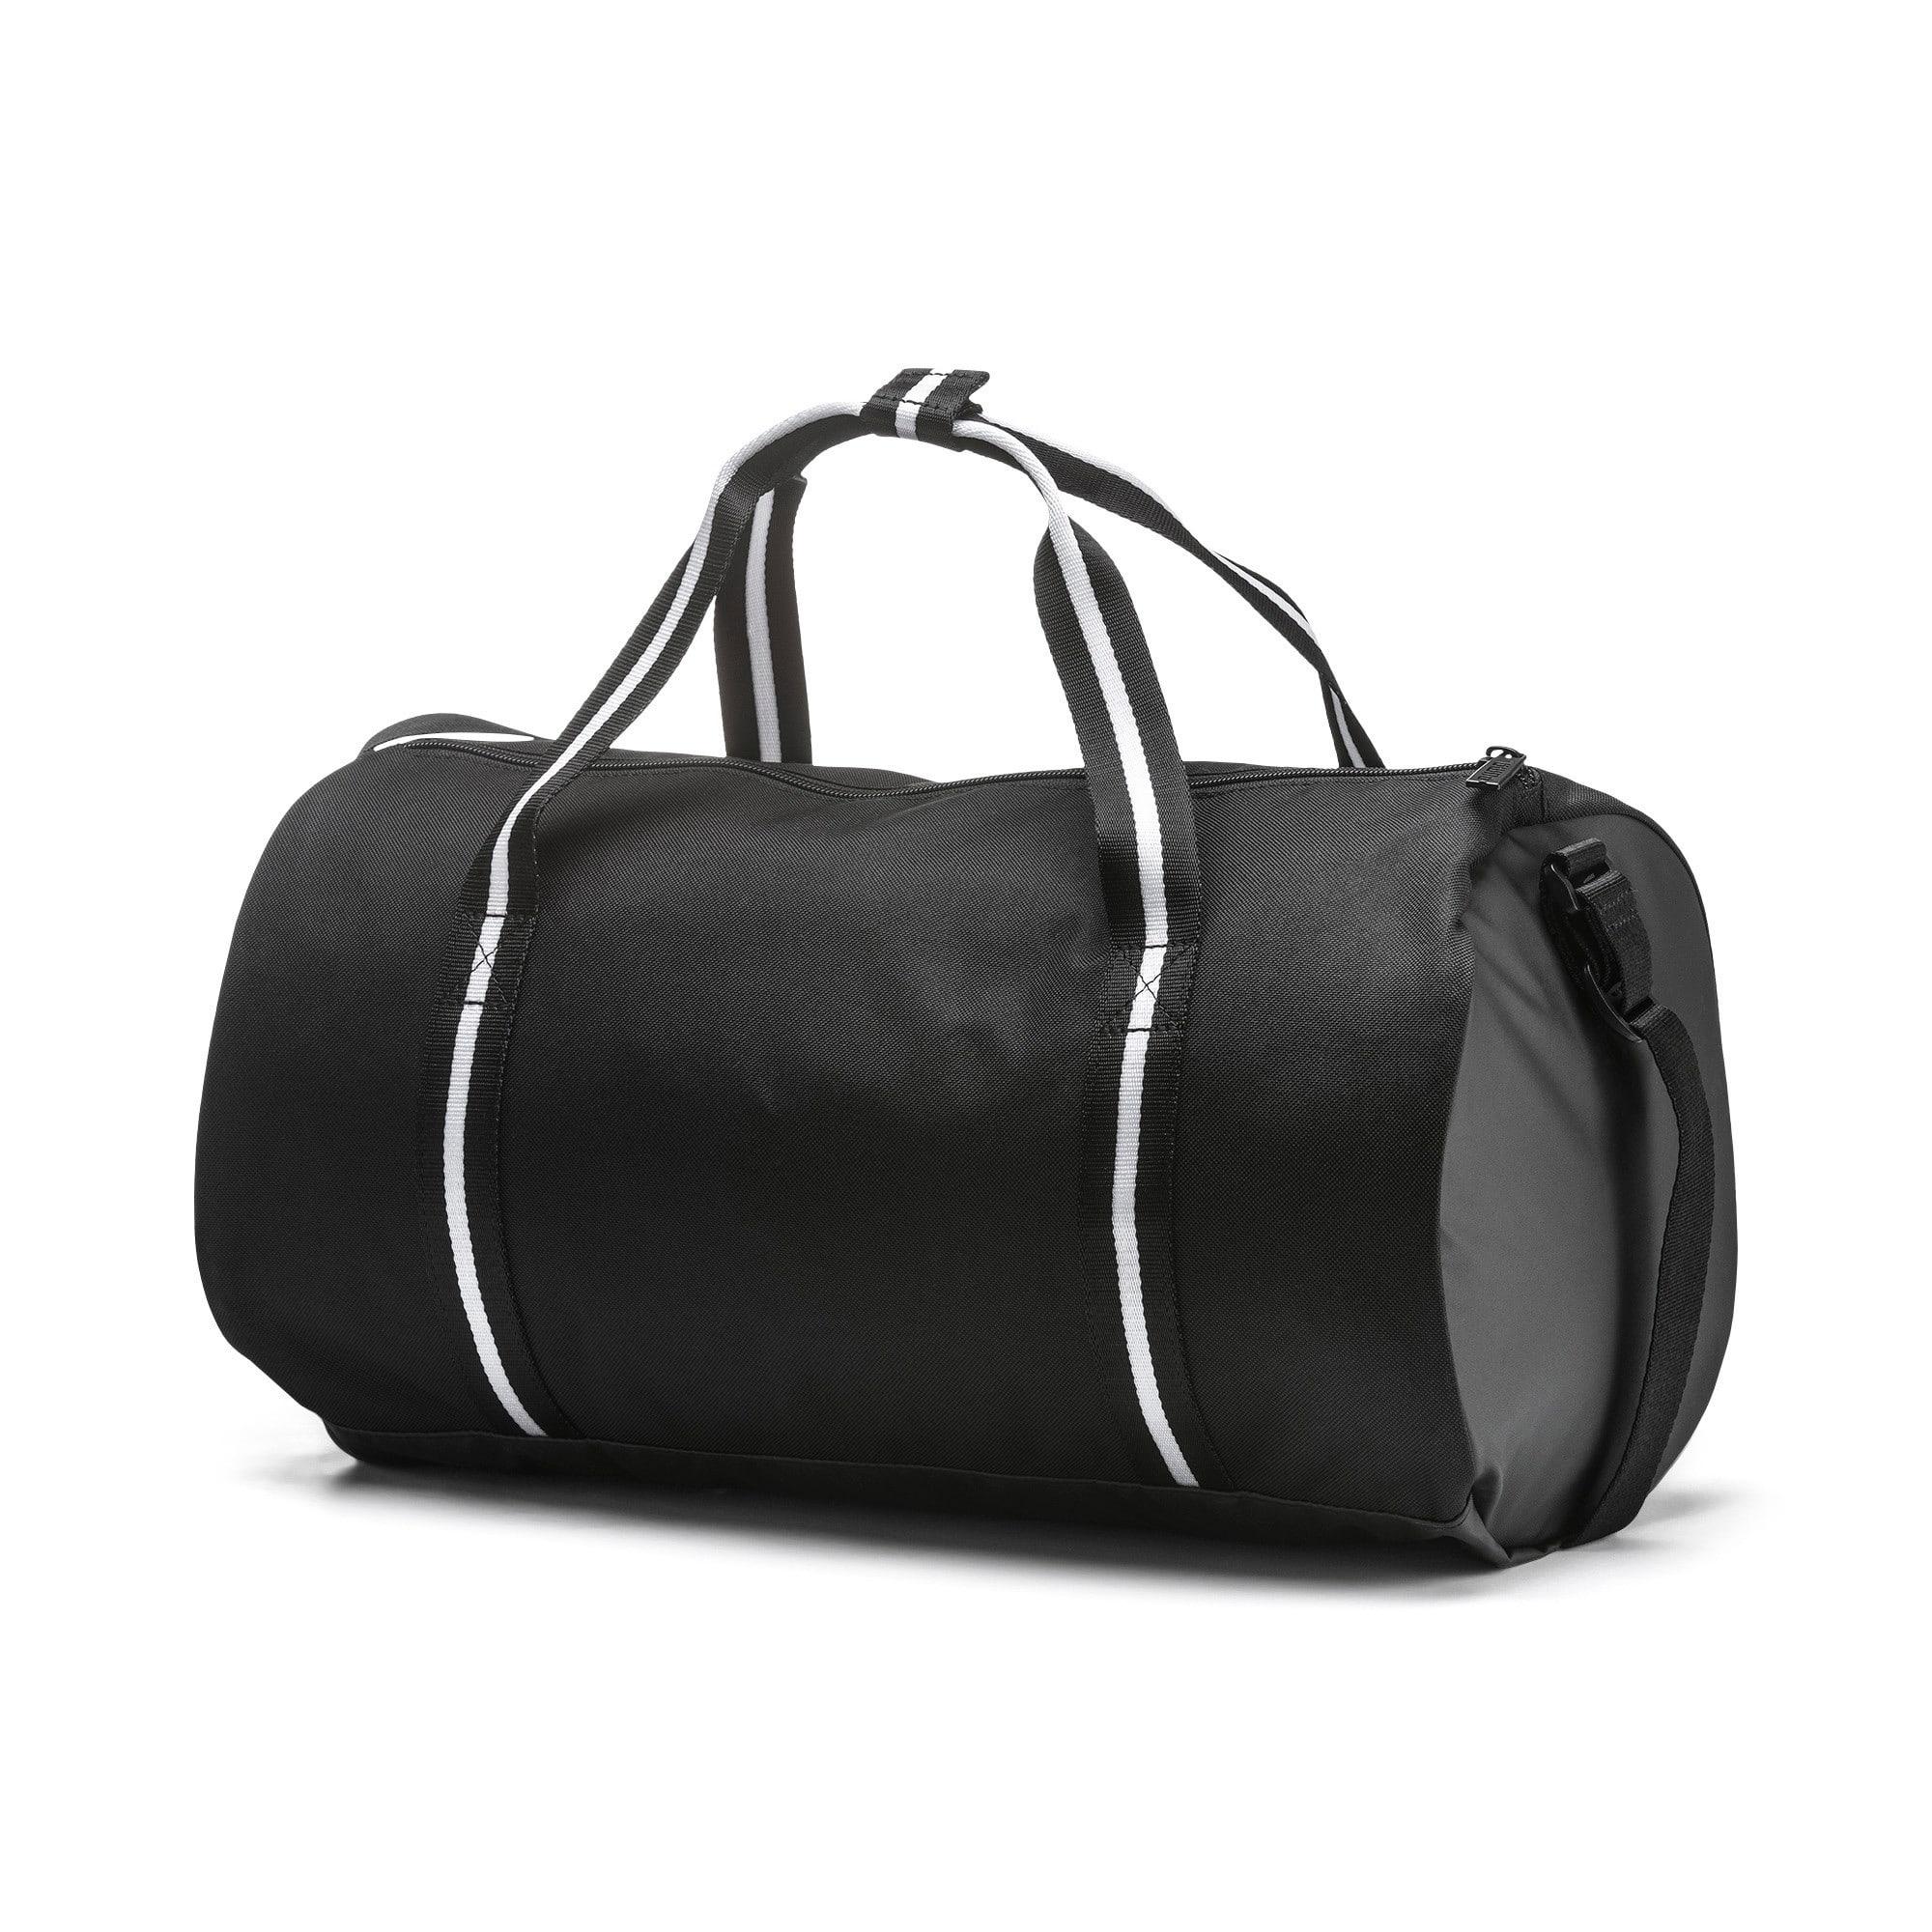 Thumbnail 3 of Core Base Barrel Bag, Puma Black, medium